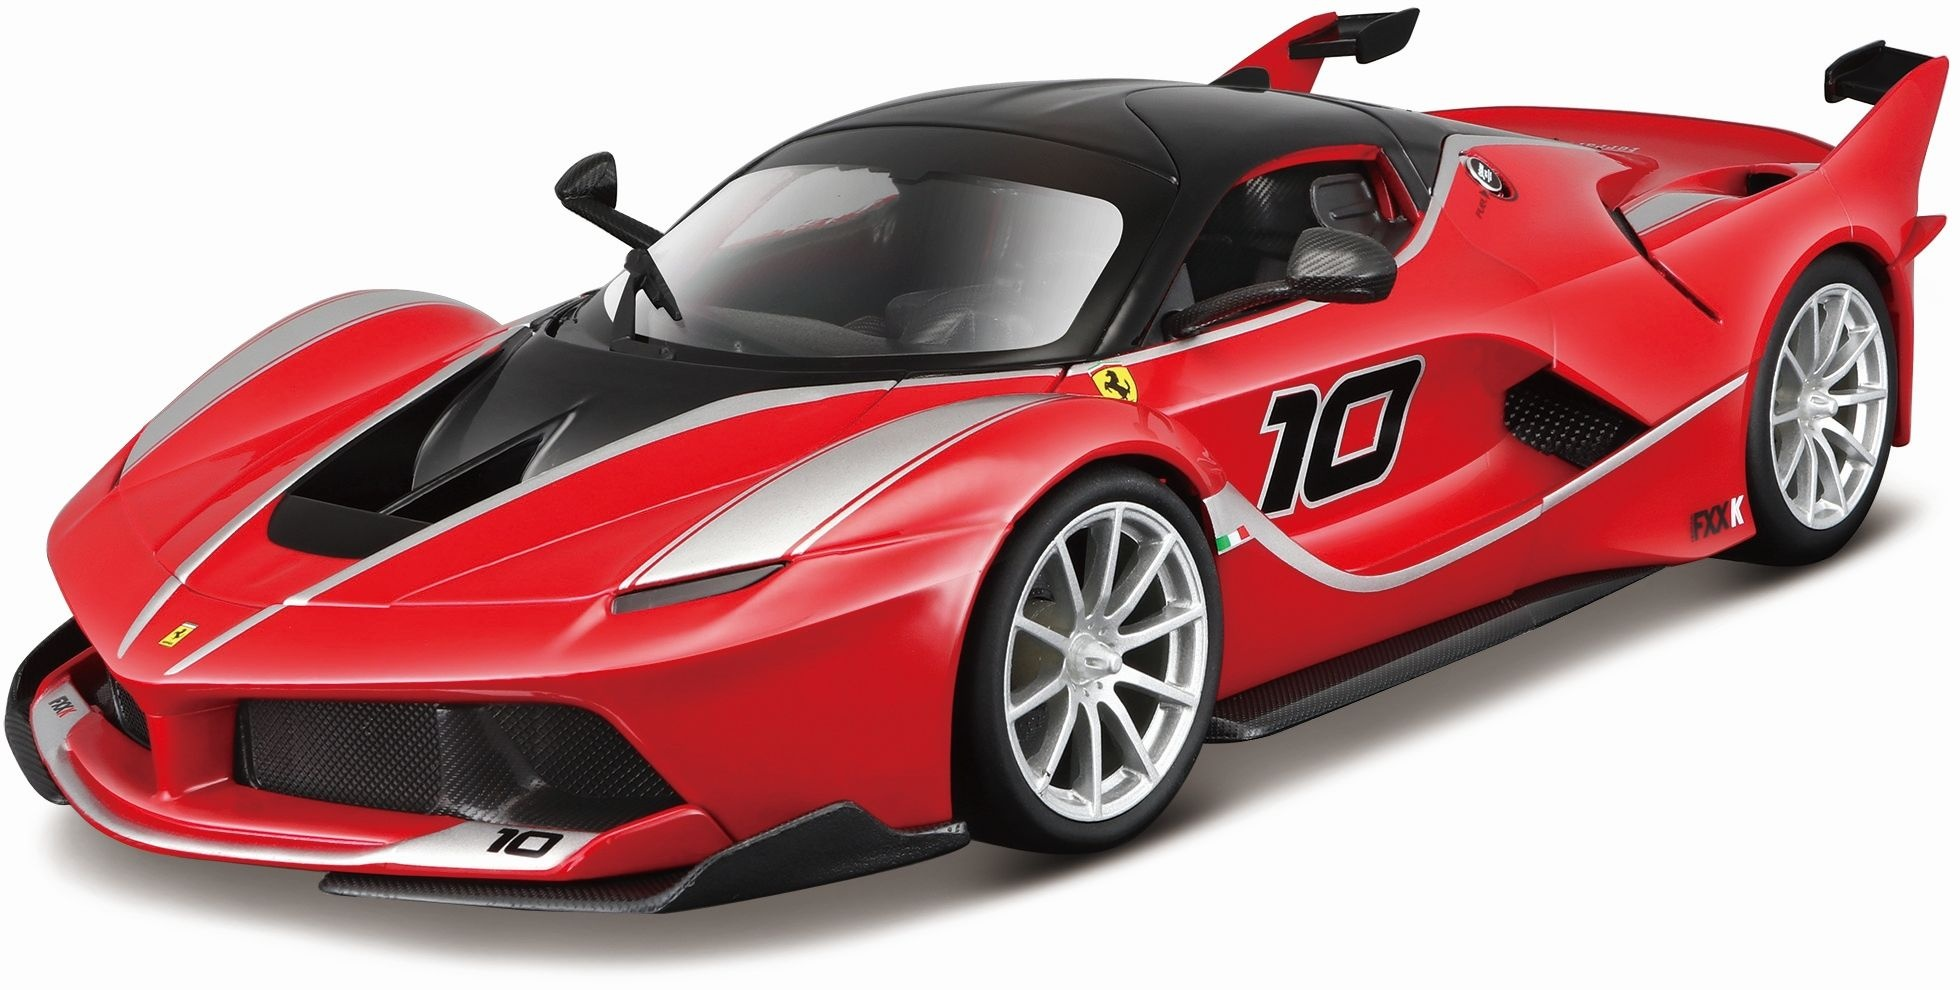 Bburago Miniature Ferrari Fxx K 25 Cm Red Internet Toys